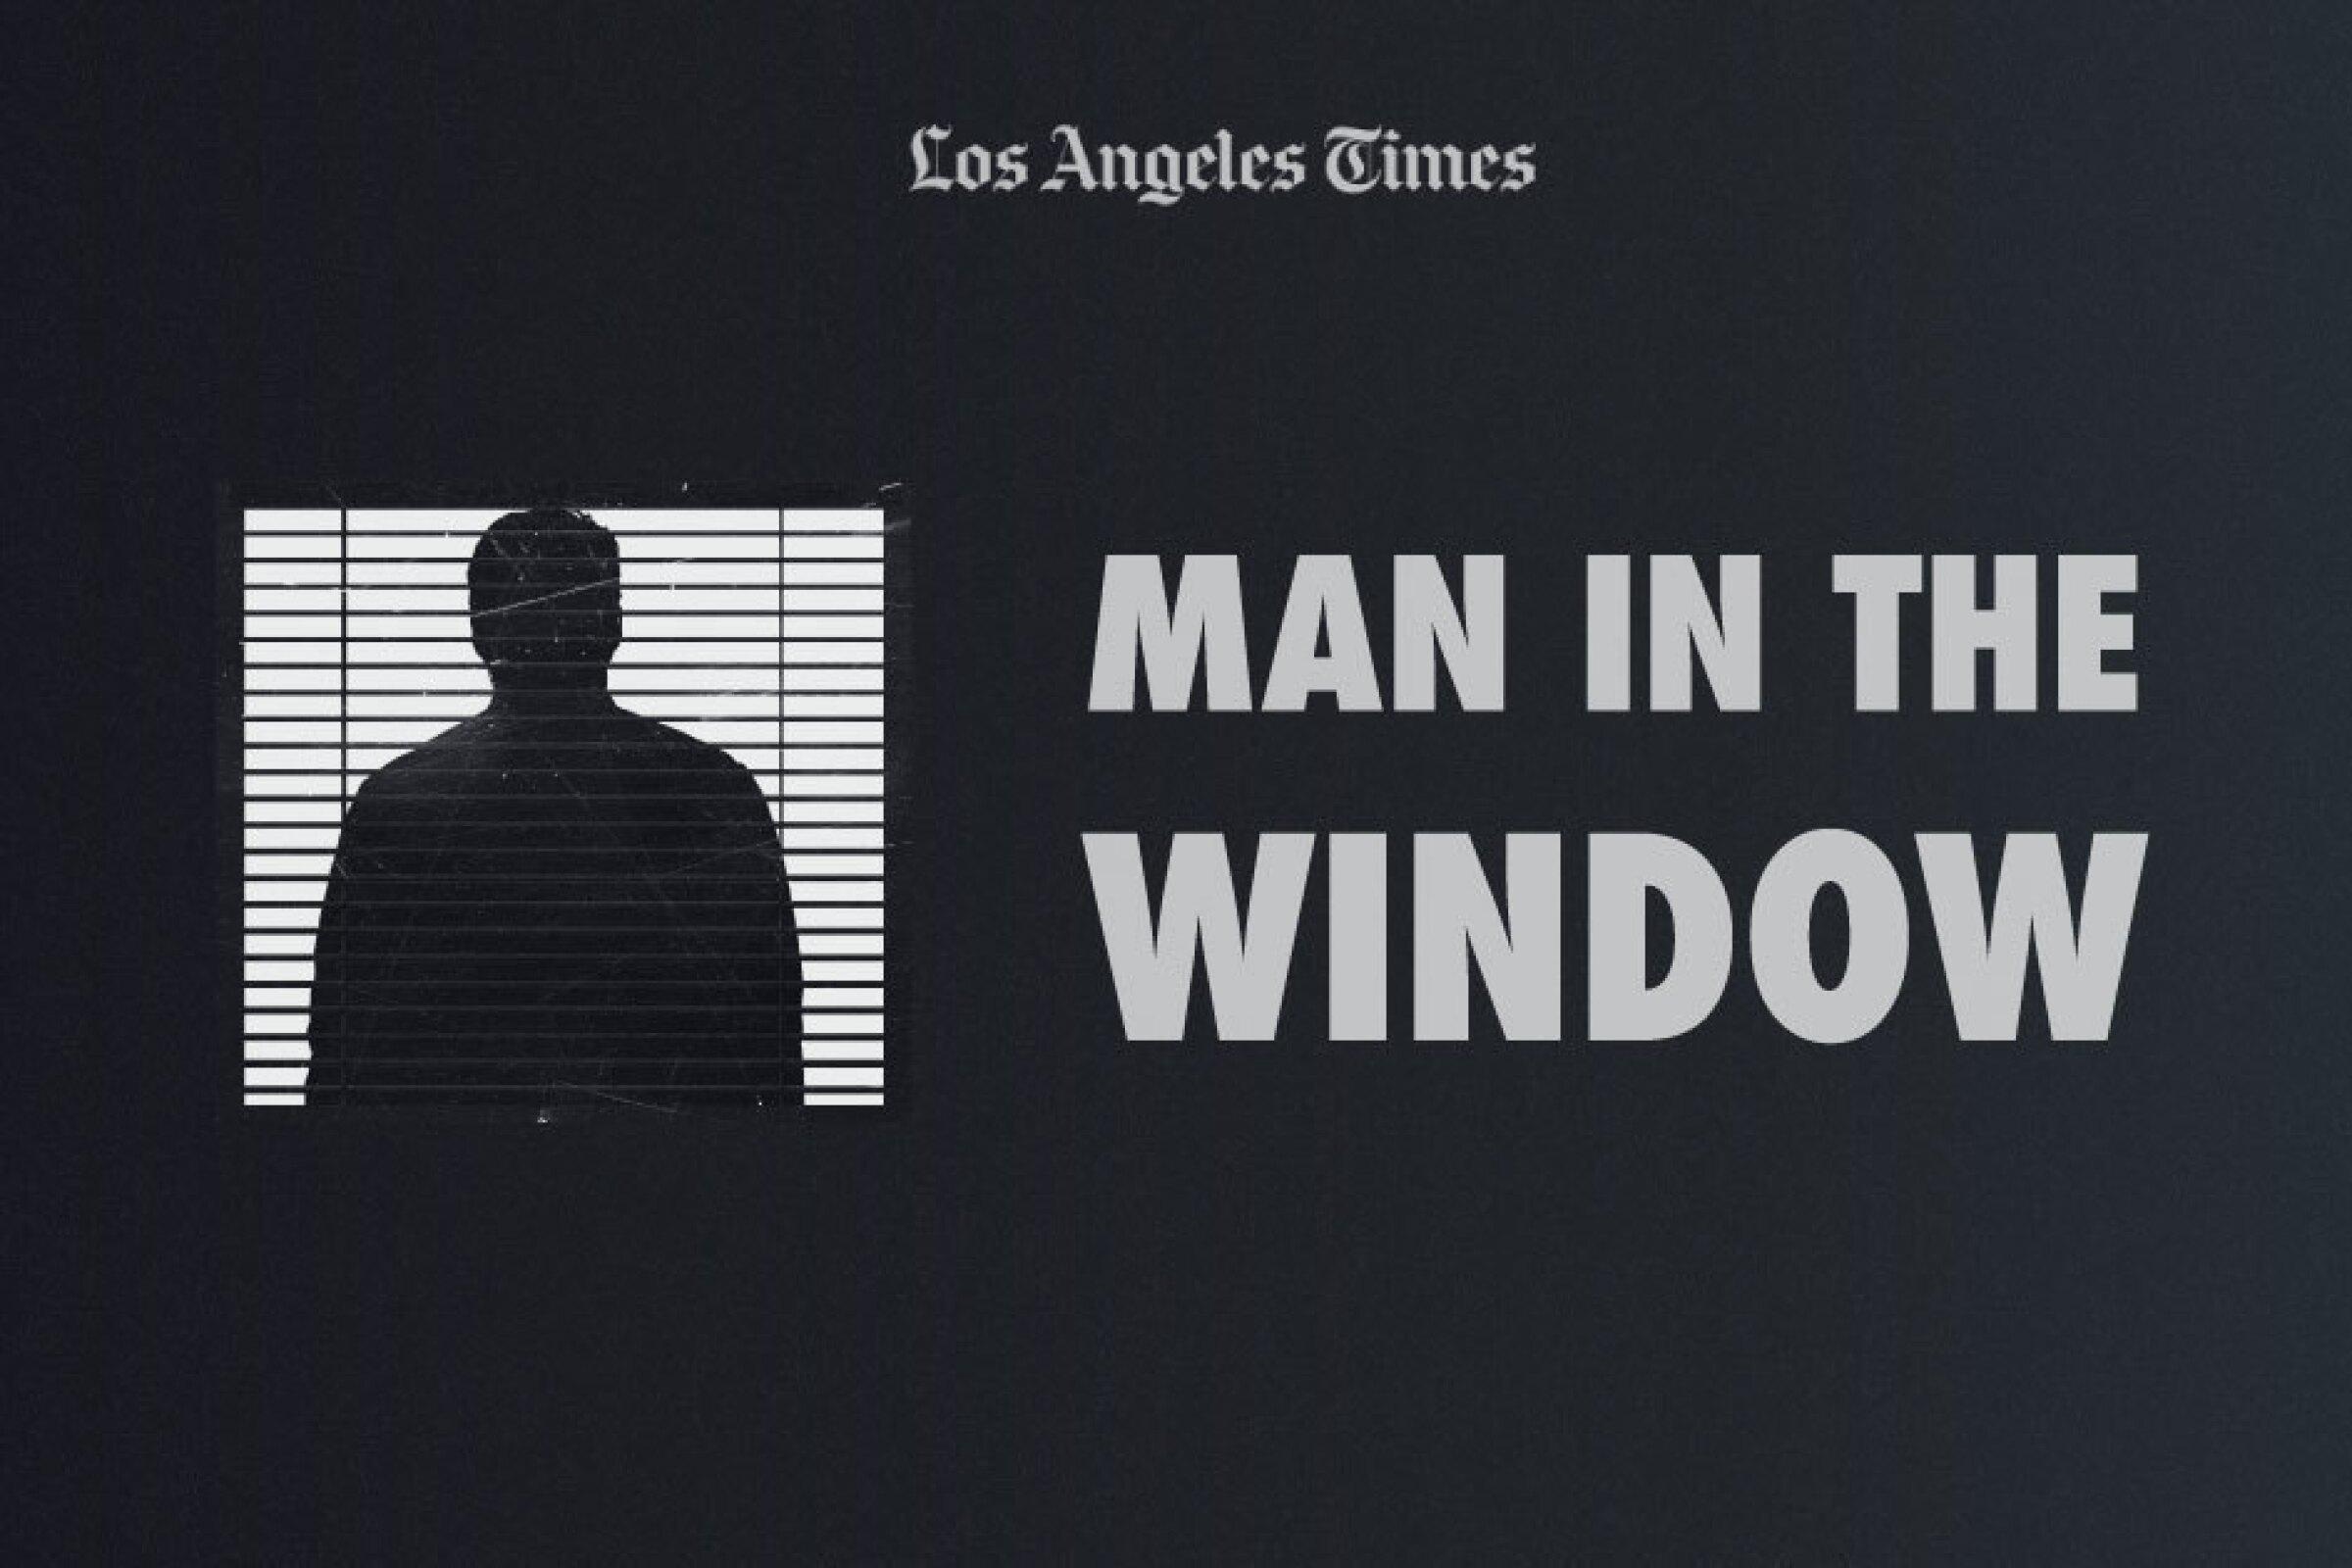 Man in the window illustration